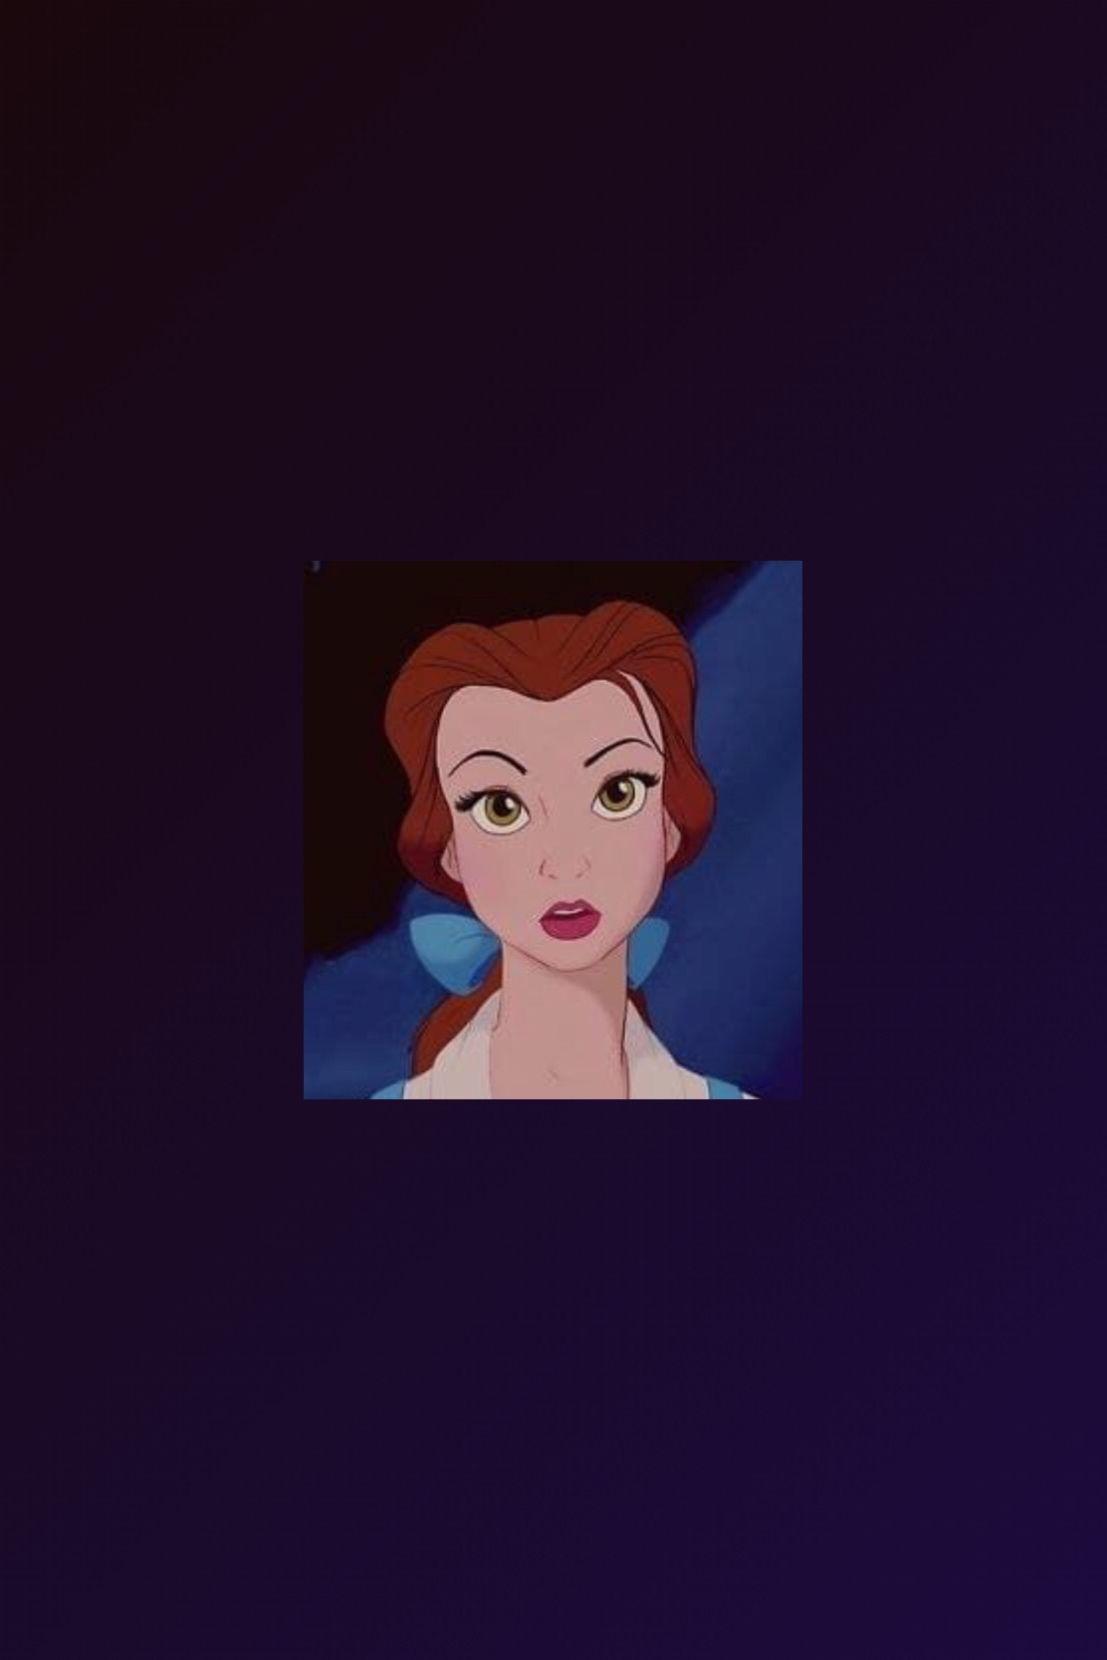 Fond D Ecran Belle Fond D Ecran Telephone Dessin Princesse Disney Princesses Disney Belle